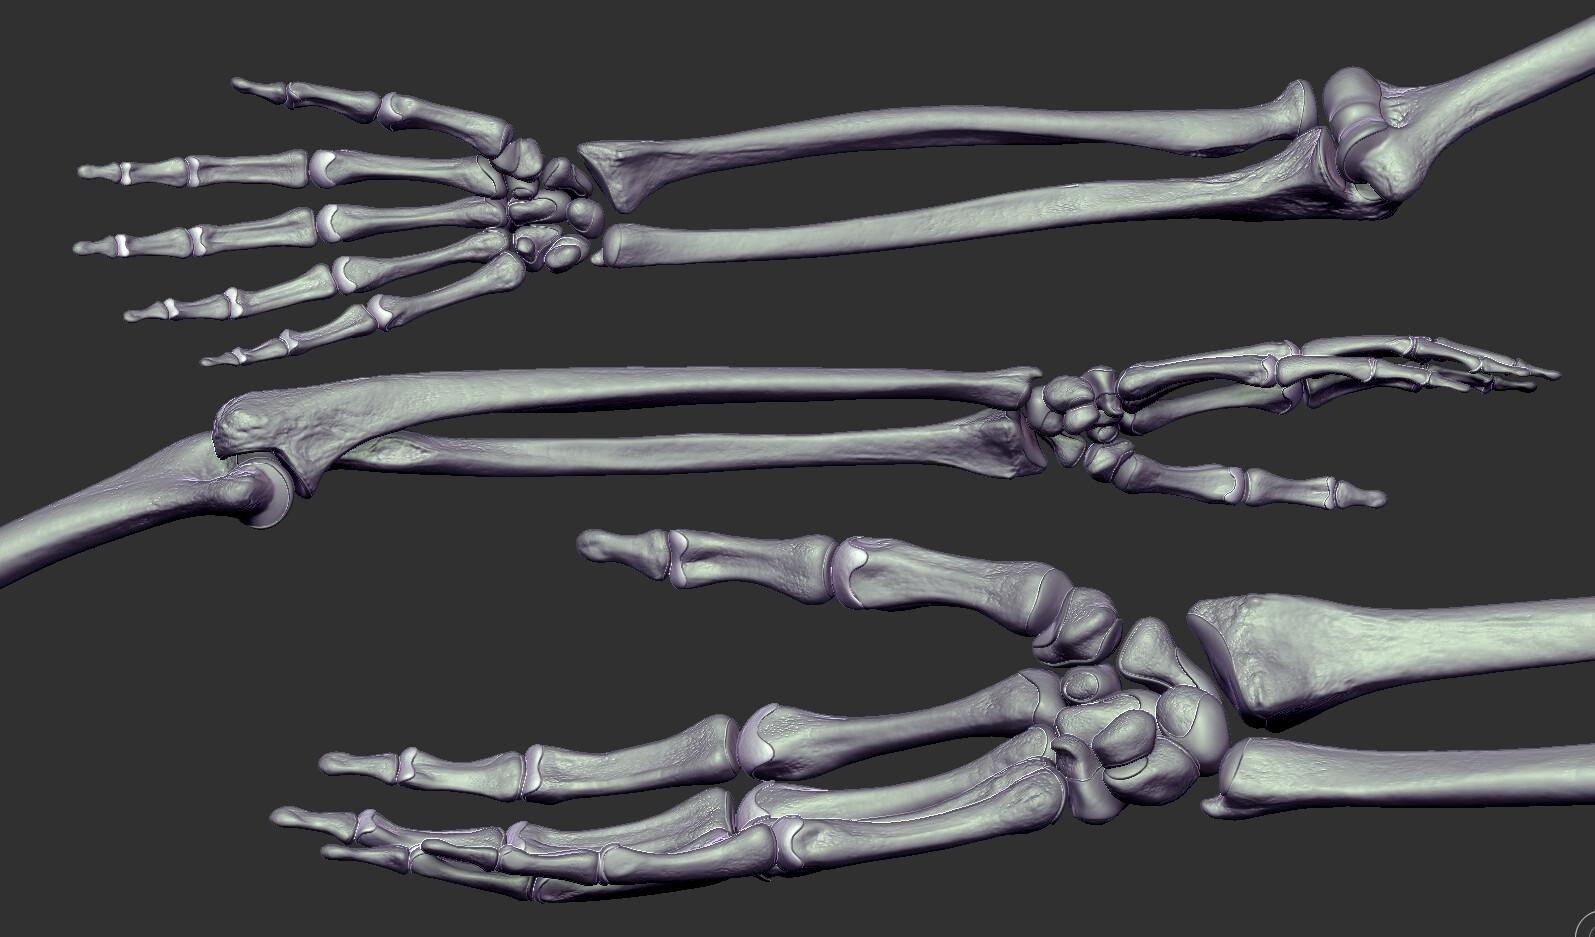 Andrey gritsuk hand 7s